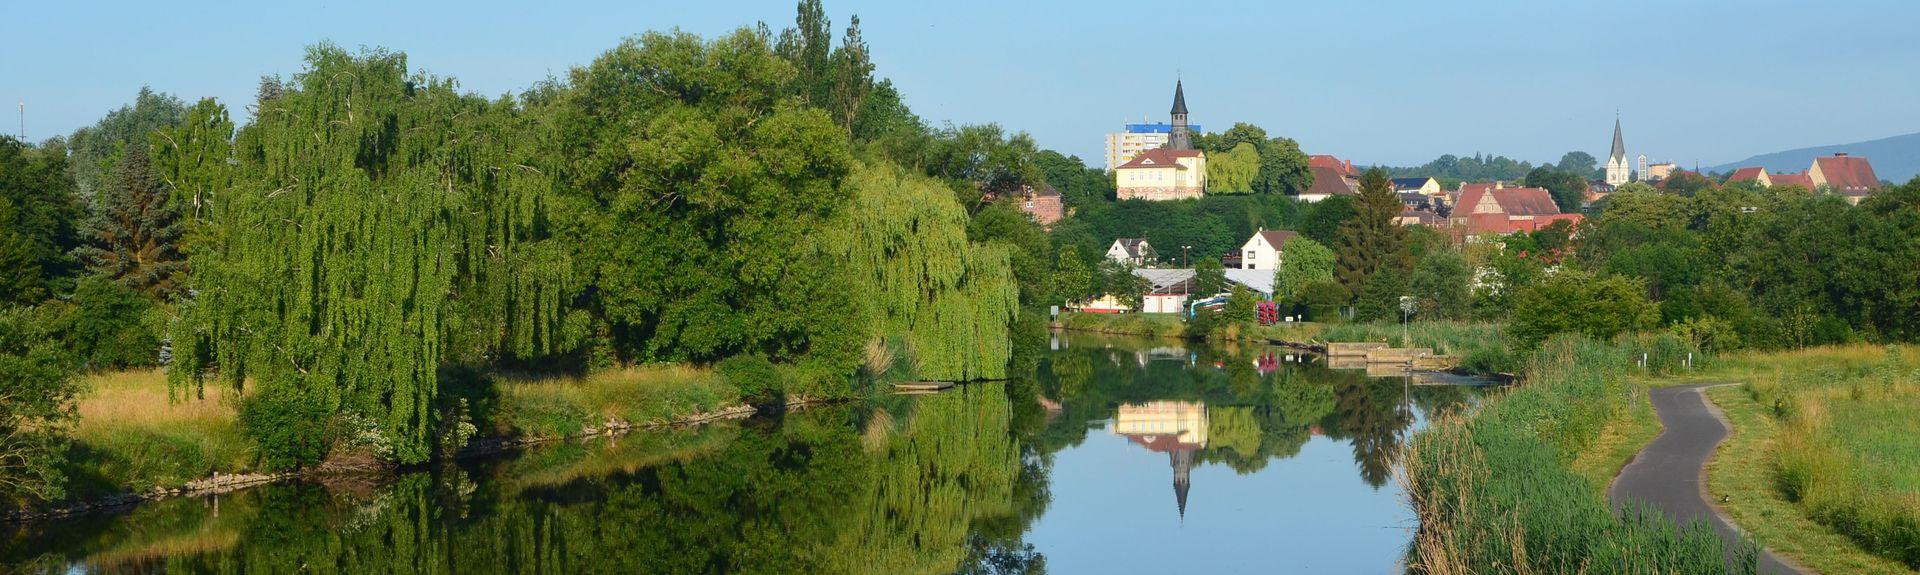 Treffurt, Thuringia, Germany